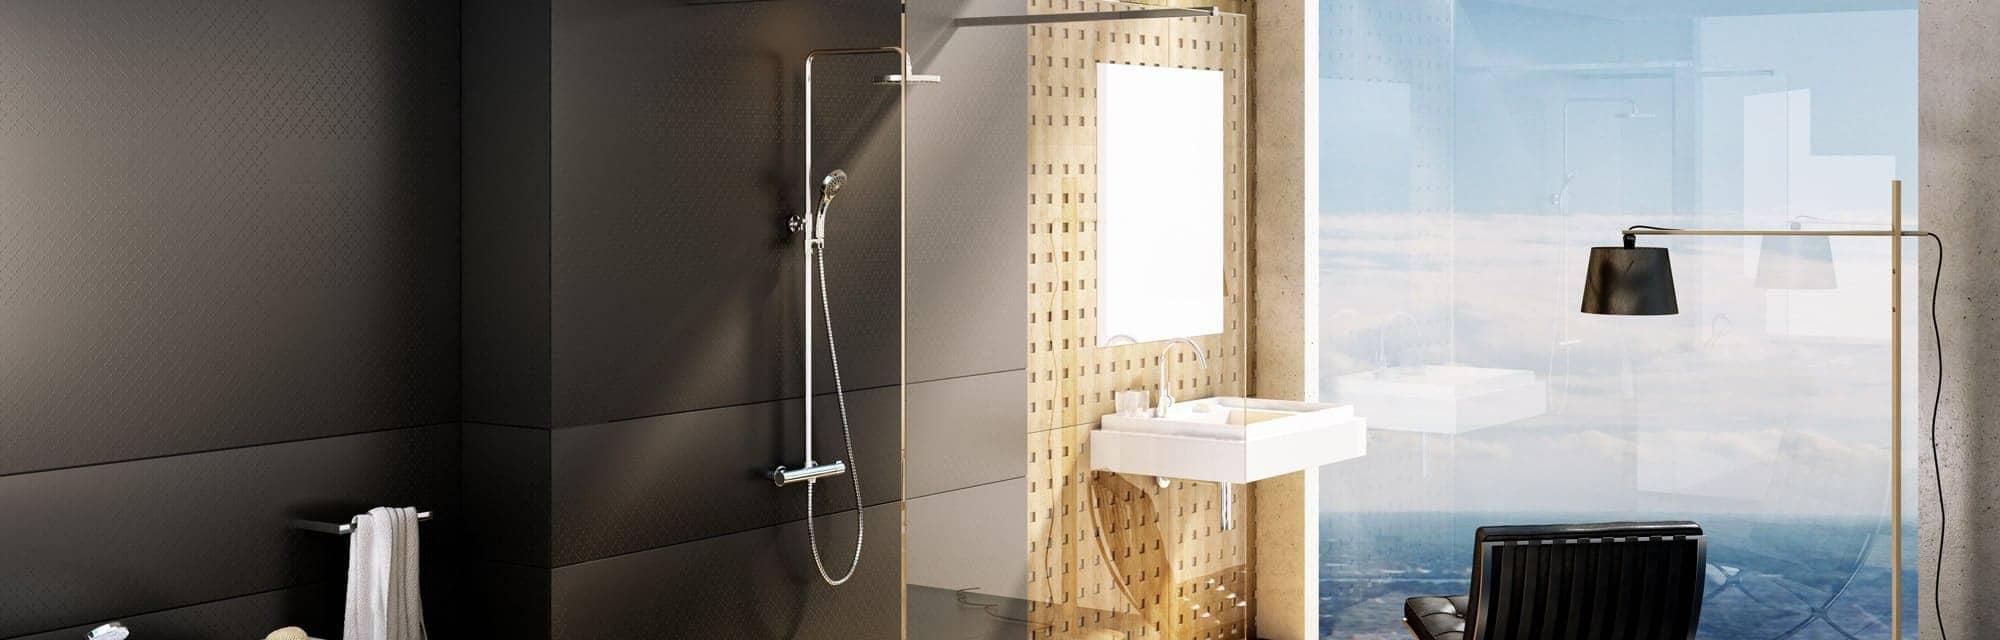 RAVAK a.s. - Acrylic Bathtubs and Shower Enclosures